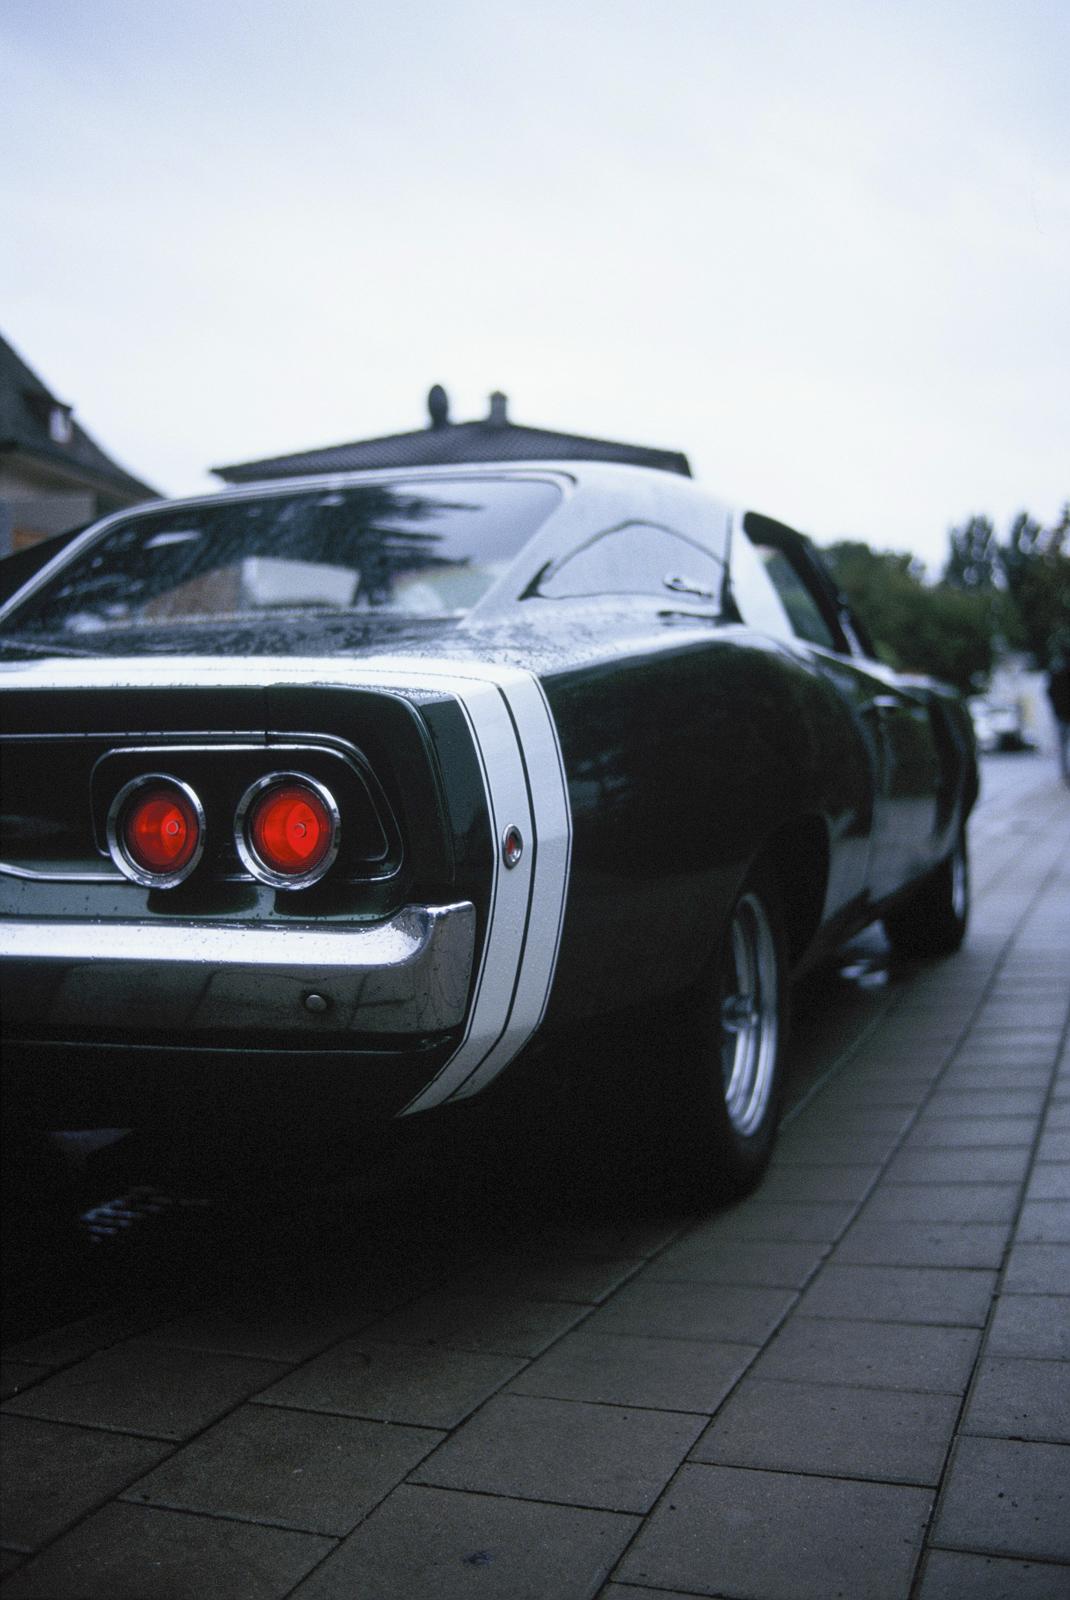 PhotoExif - Camera: Leica R7 — silver, Film: Kodak Ektarchrome E100, Comment: